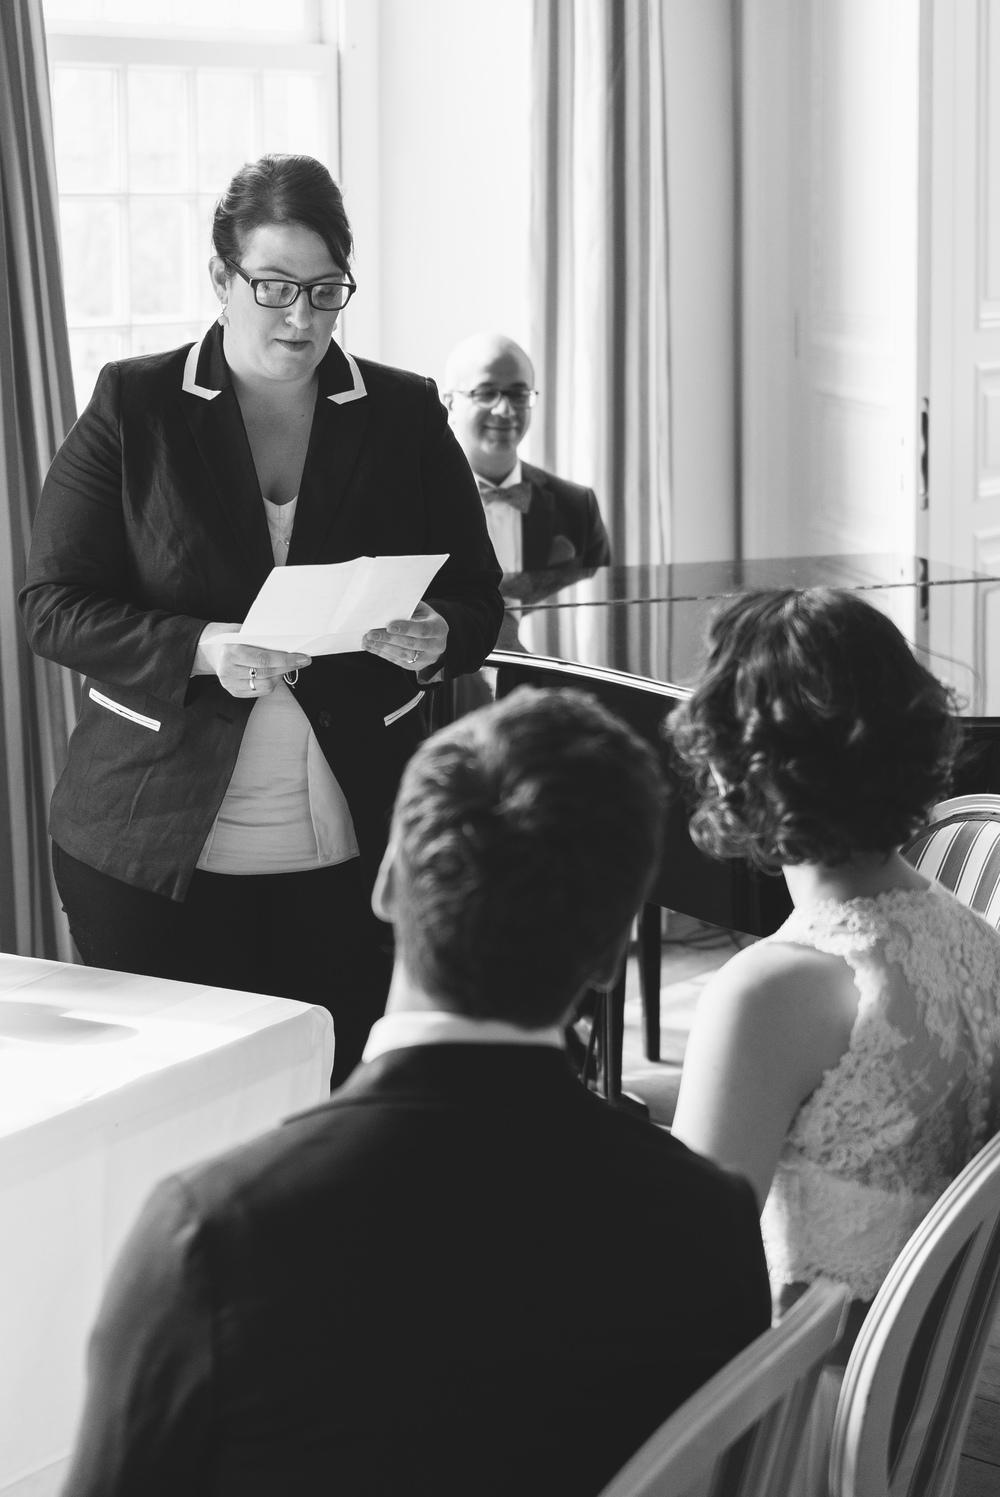 Hochzeitsfotograf-Schlossruine-Hertefeld-Weeze-072.jpg